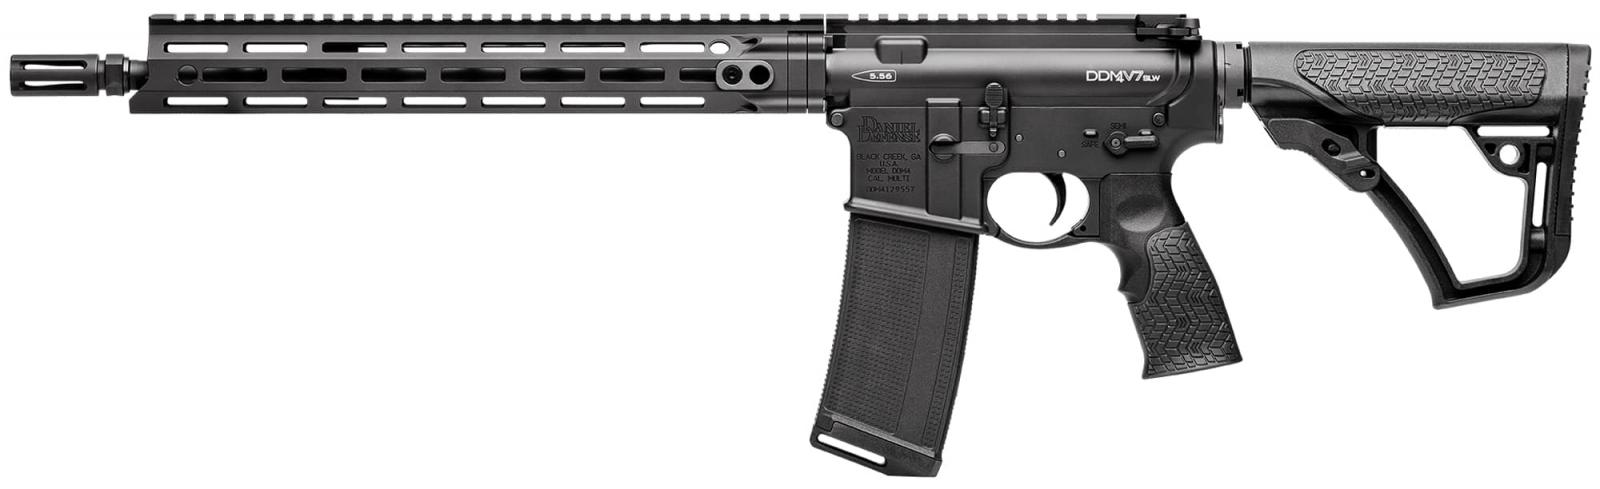 Carabine type AR15 DANIEL DEFENSE M4 SLW Black Cal 5,56 mm (223 Rem)